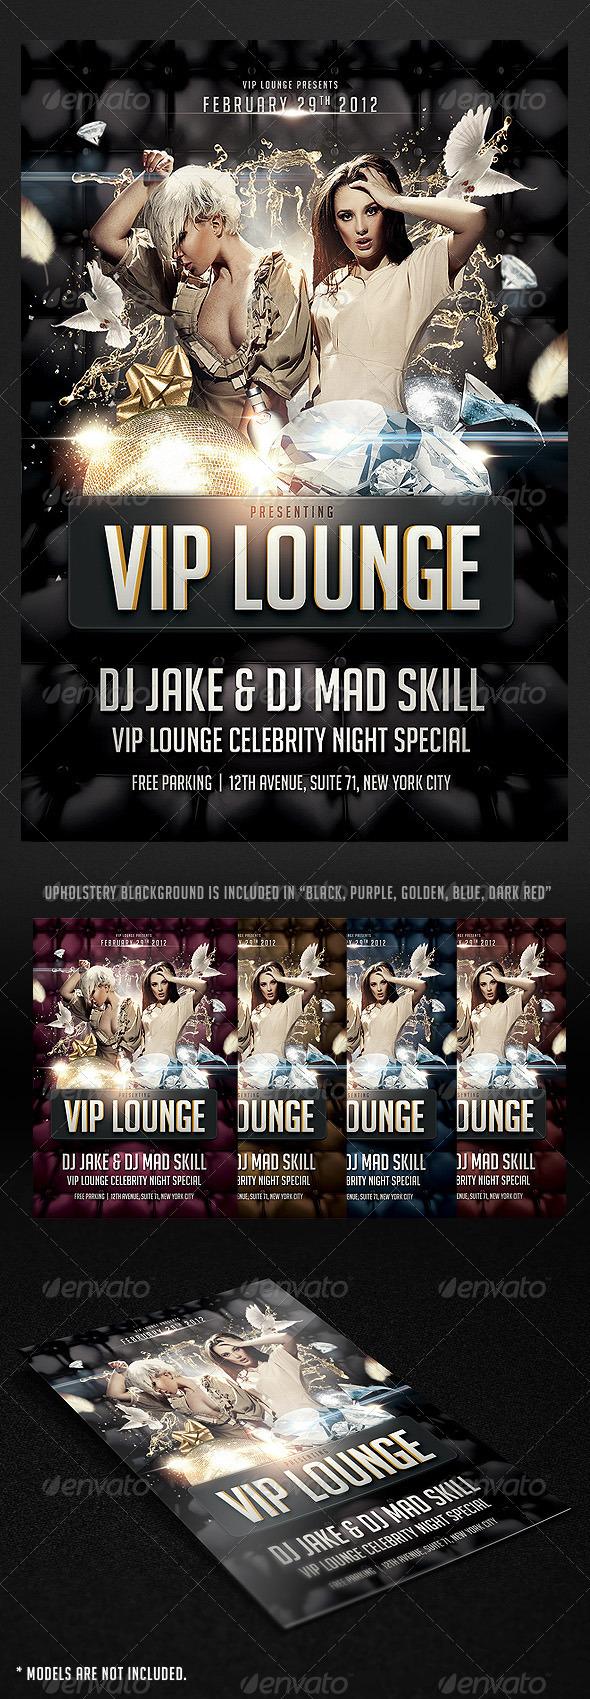 VIP Lounge Flyer - Flyers Print Templates